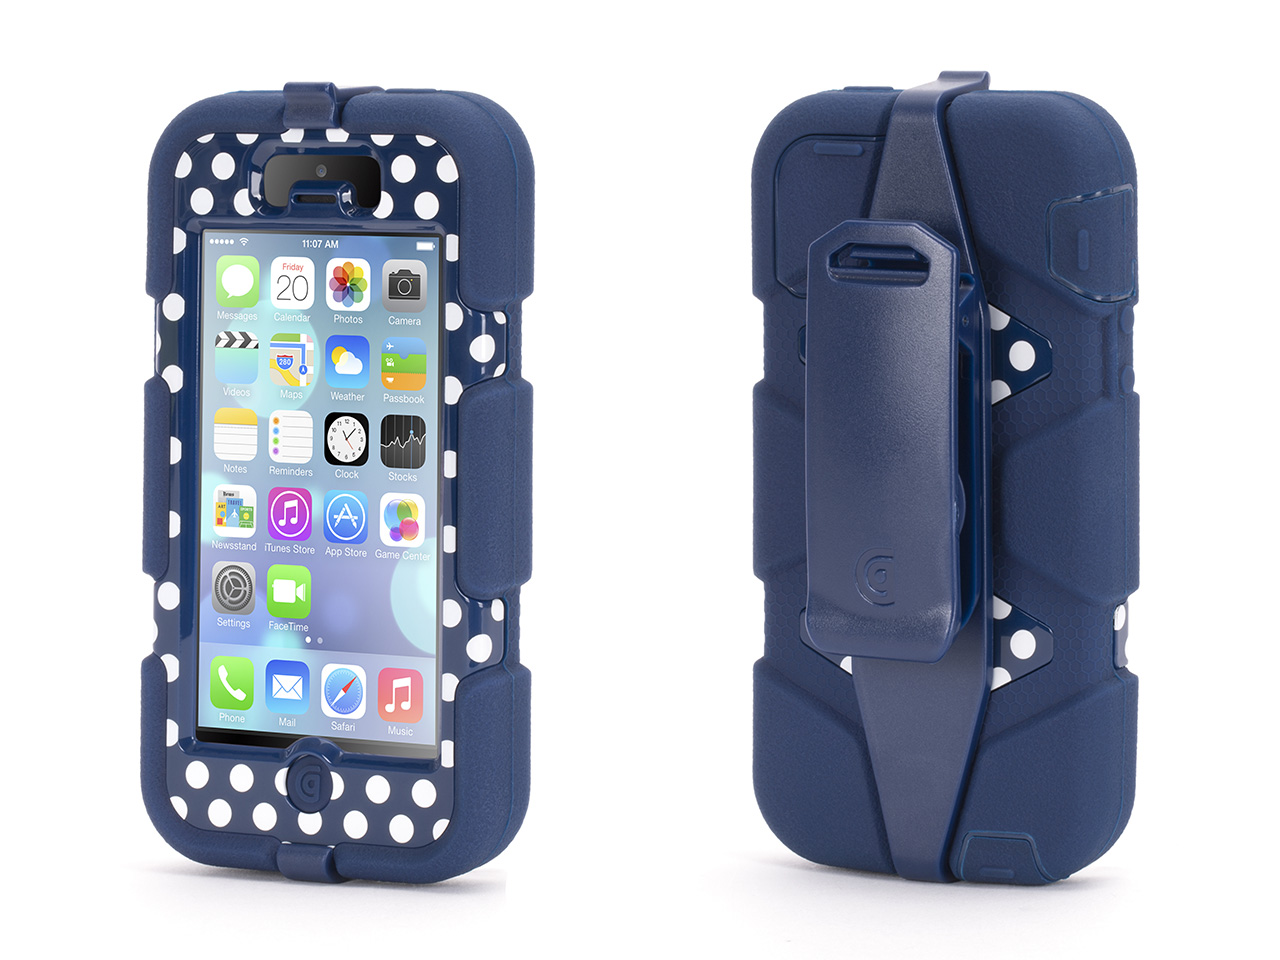 Blue/ Polka Dots Heavy Duty Survivor All-Terrain Case for iPhone 5/5s